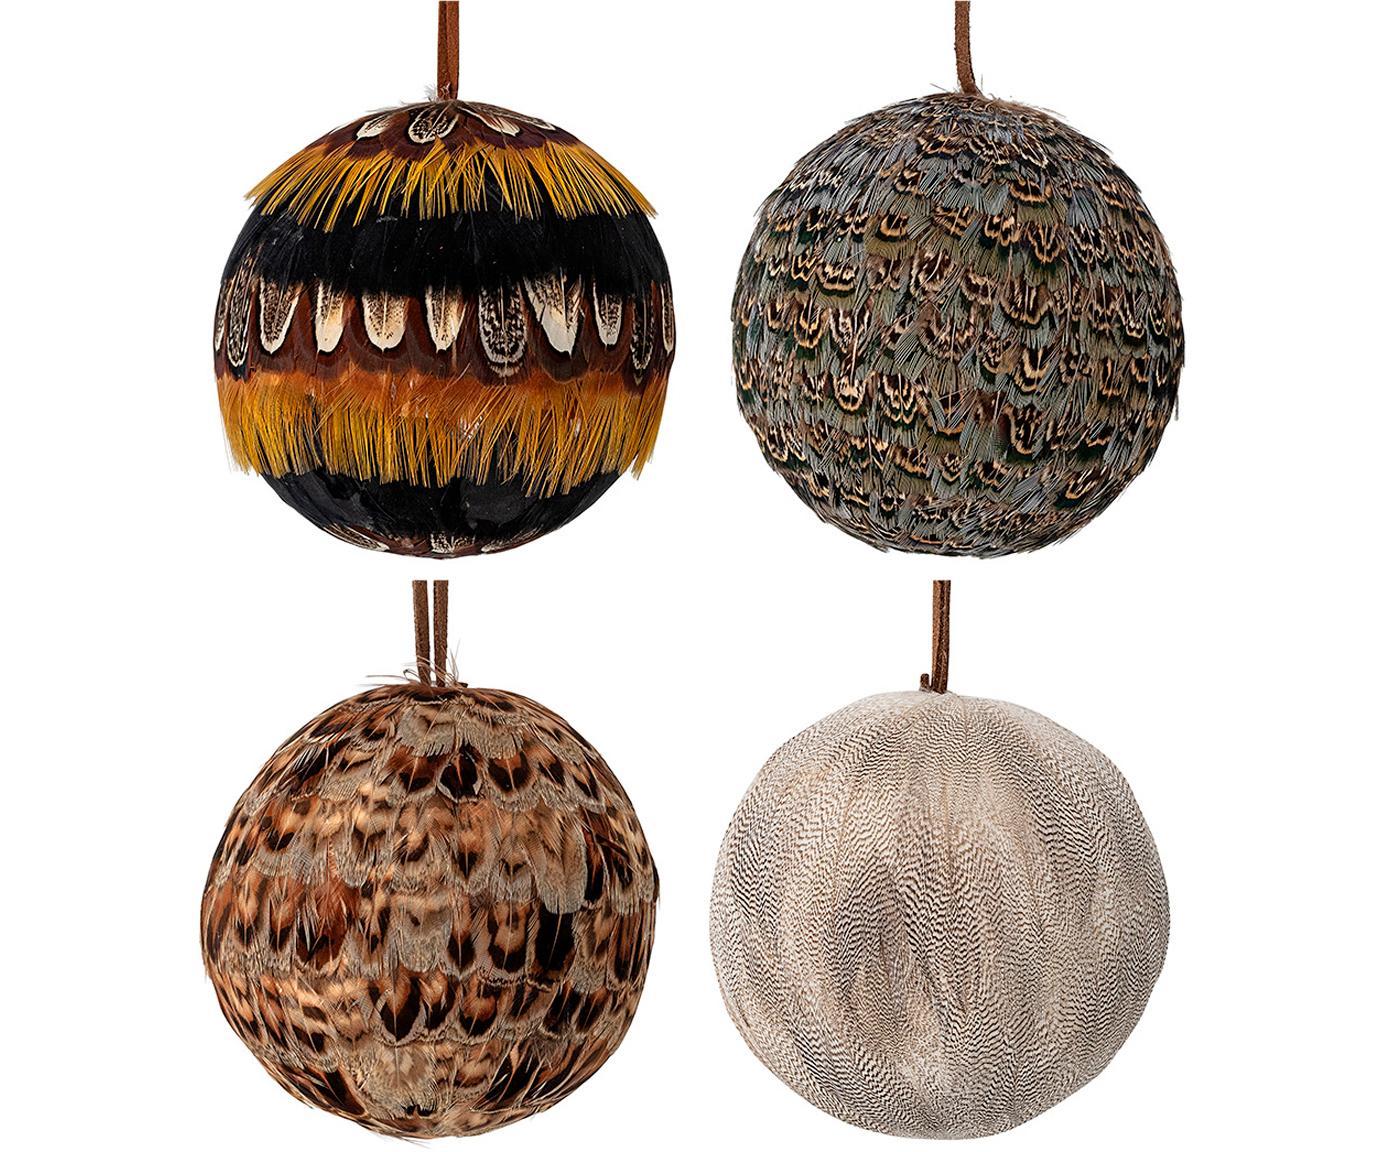 Weihnachtskugel-Set Feather Ø9cm, 4-tlg., Polystyrol, Federn, Mehrfarbig, Ø 9 cm